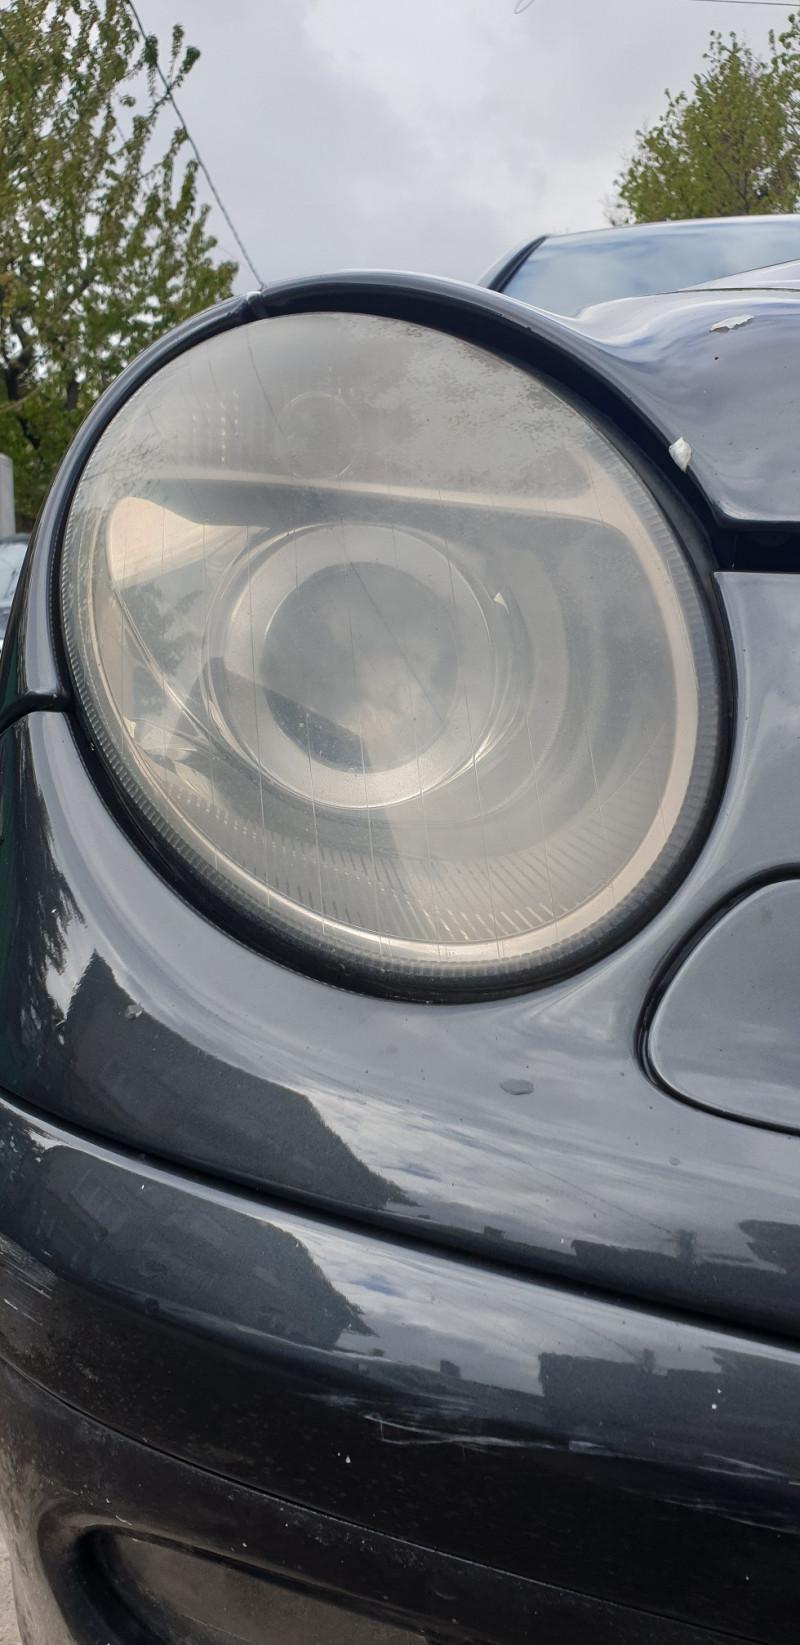 Mercedes-Benz Е 270 - image 13